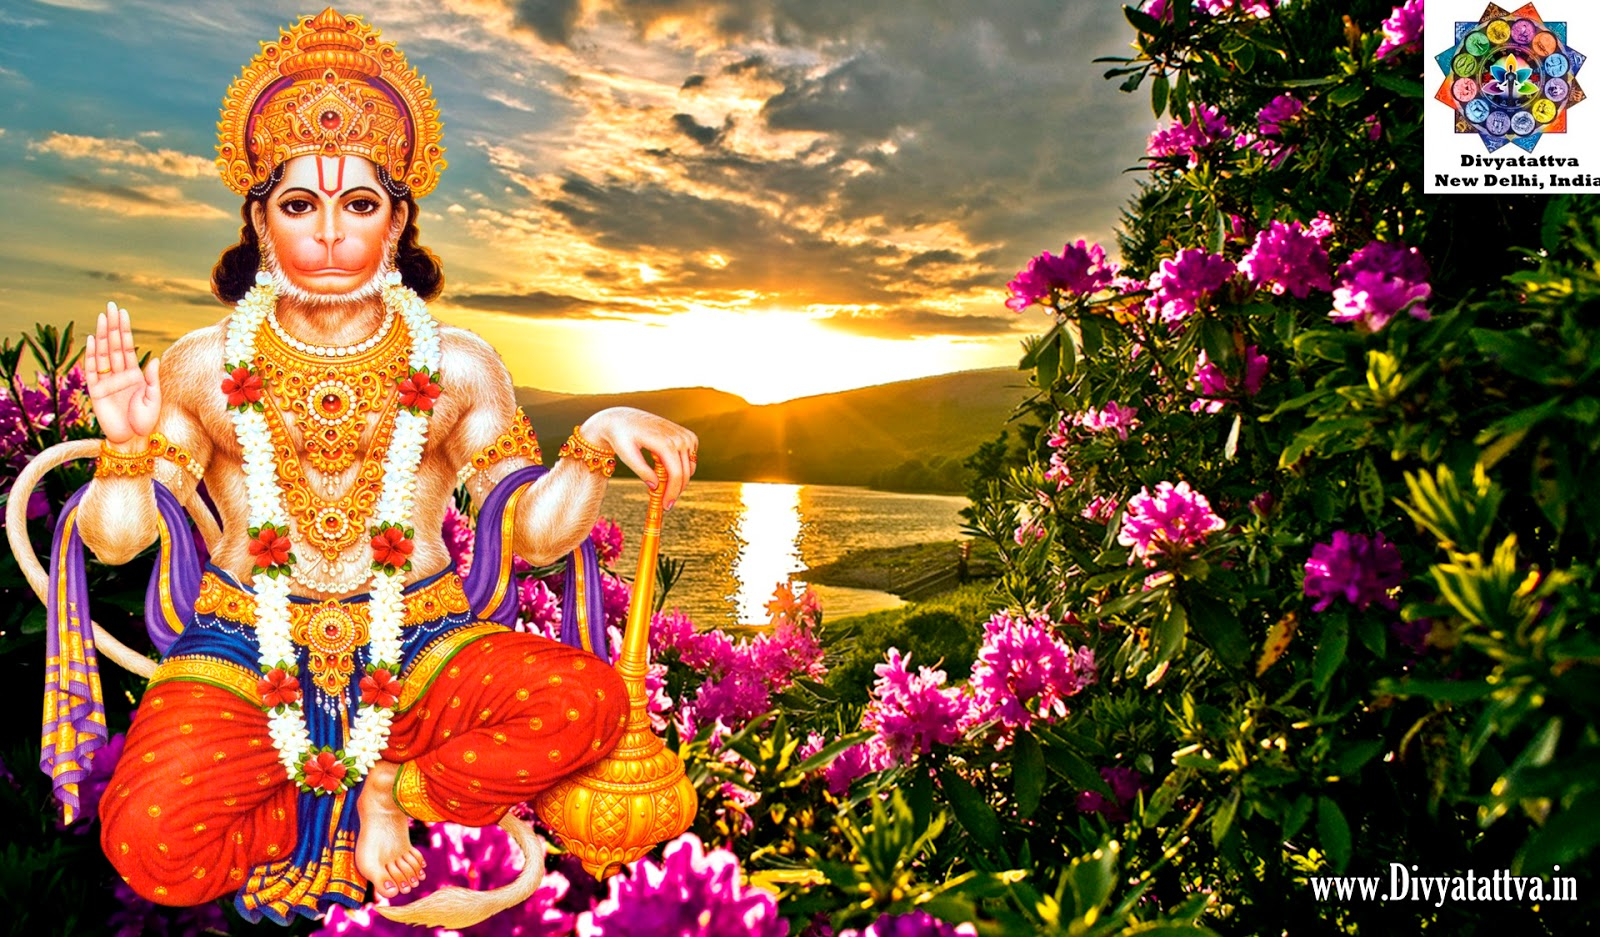 Divyatattva Astrology Free Horoscopes Psychic Tarot Yoga Tantra Occult Images Videos Hindu God Hanuman Hd Wallpaper Hanuman 4k Hd Wallpaper 1080p 1920x1080